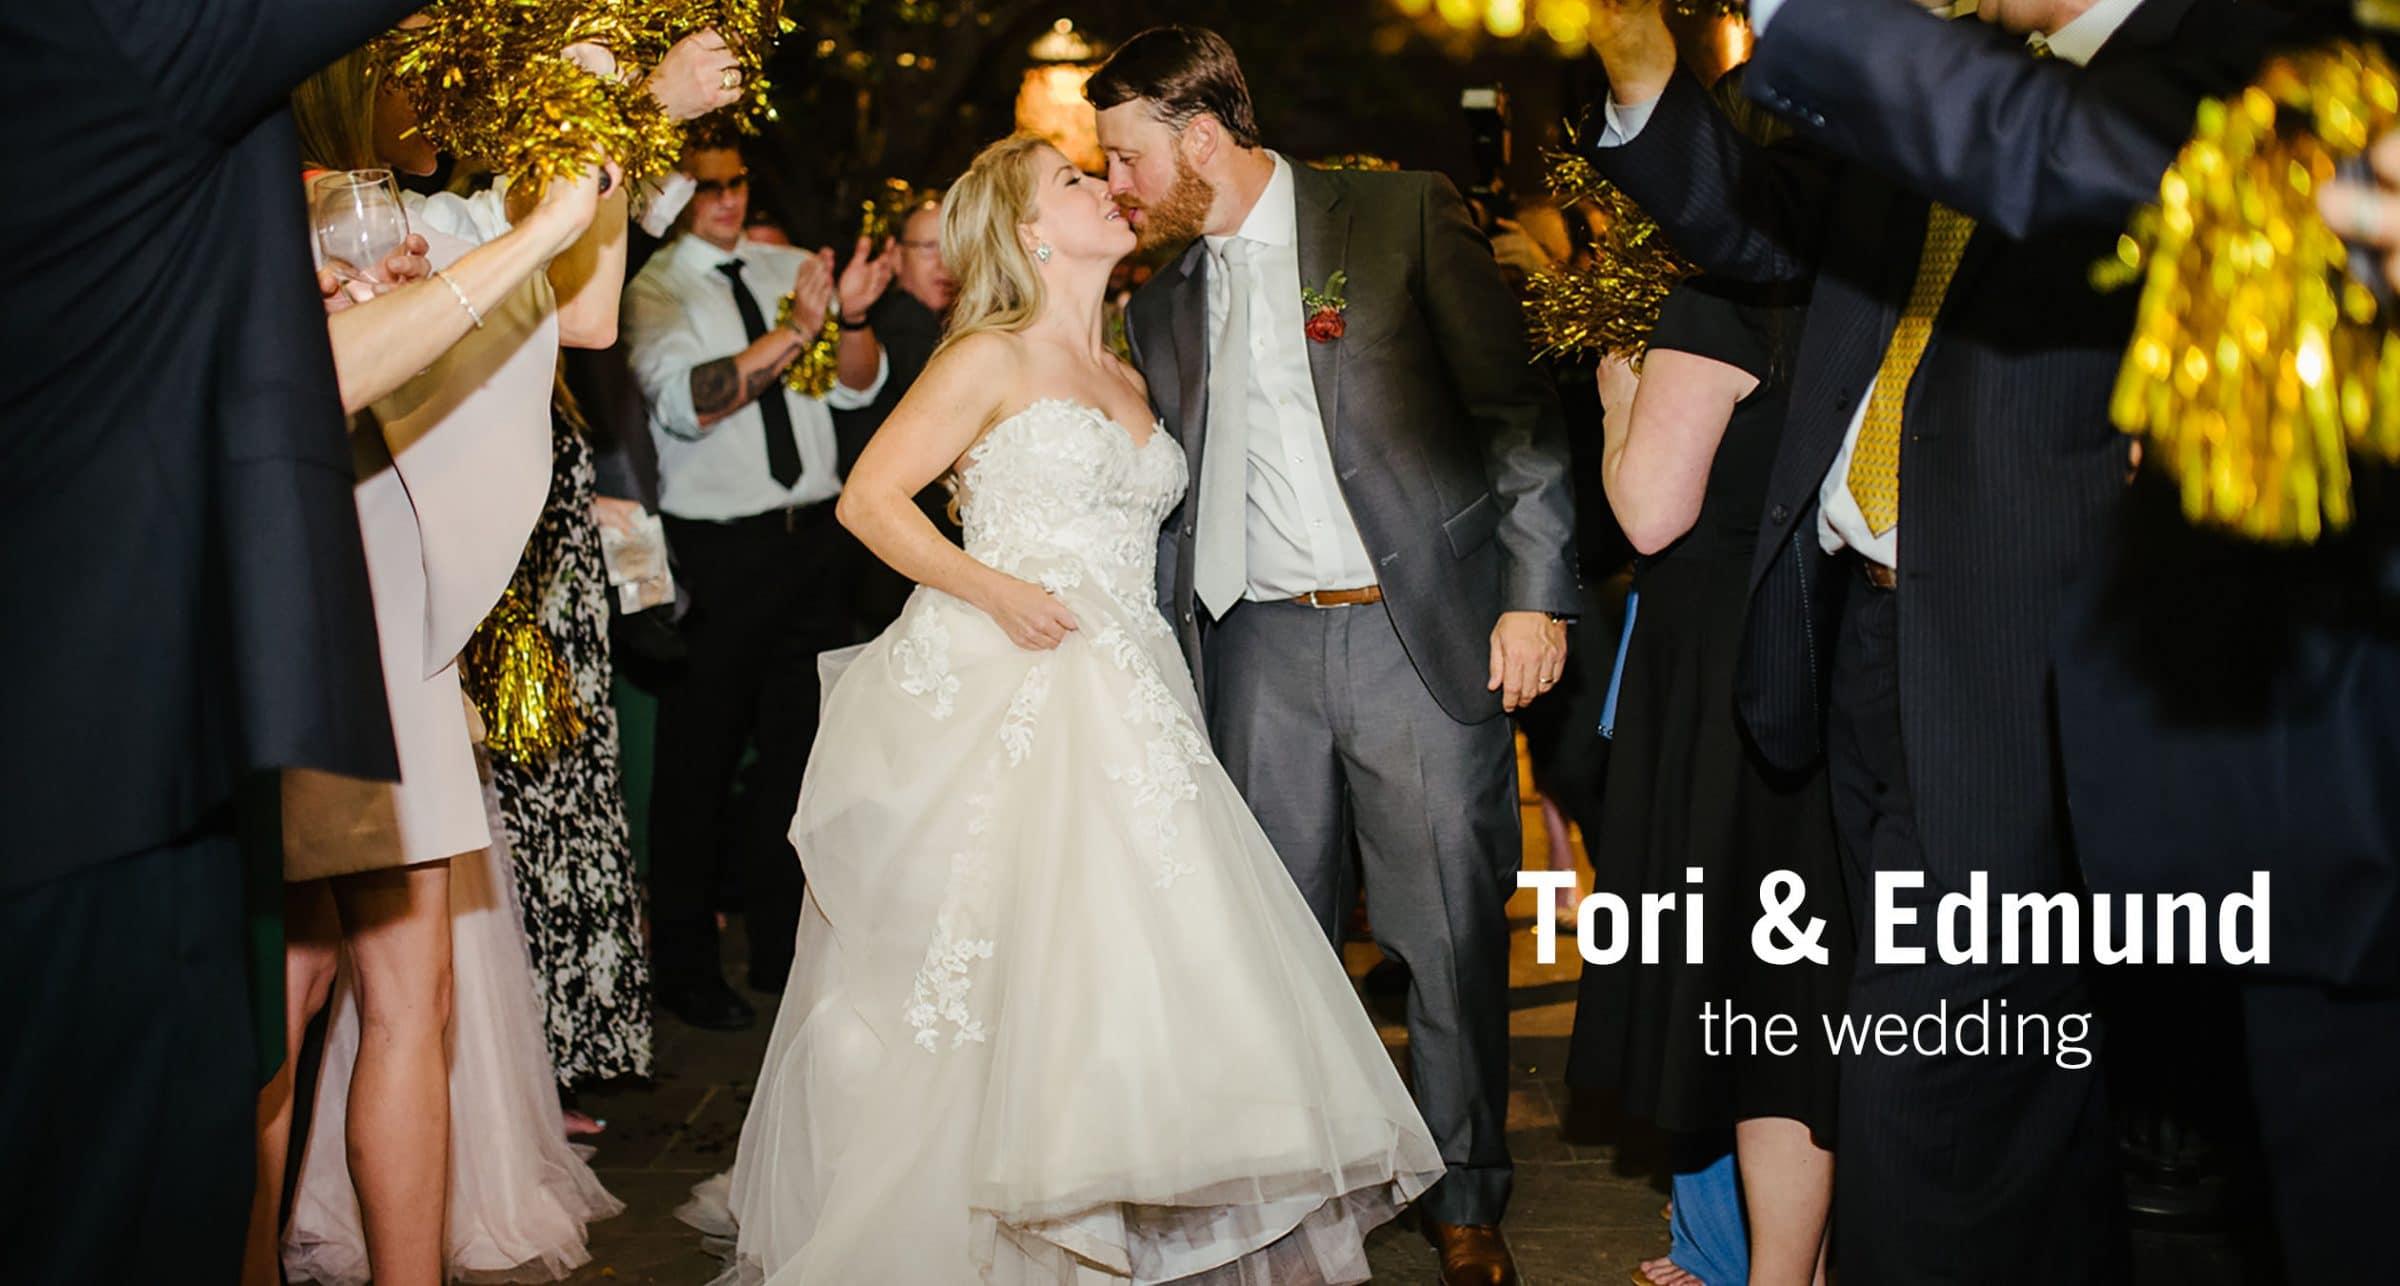 Tori and Edmund